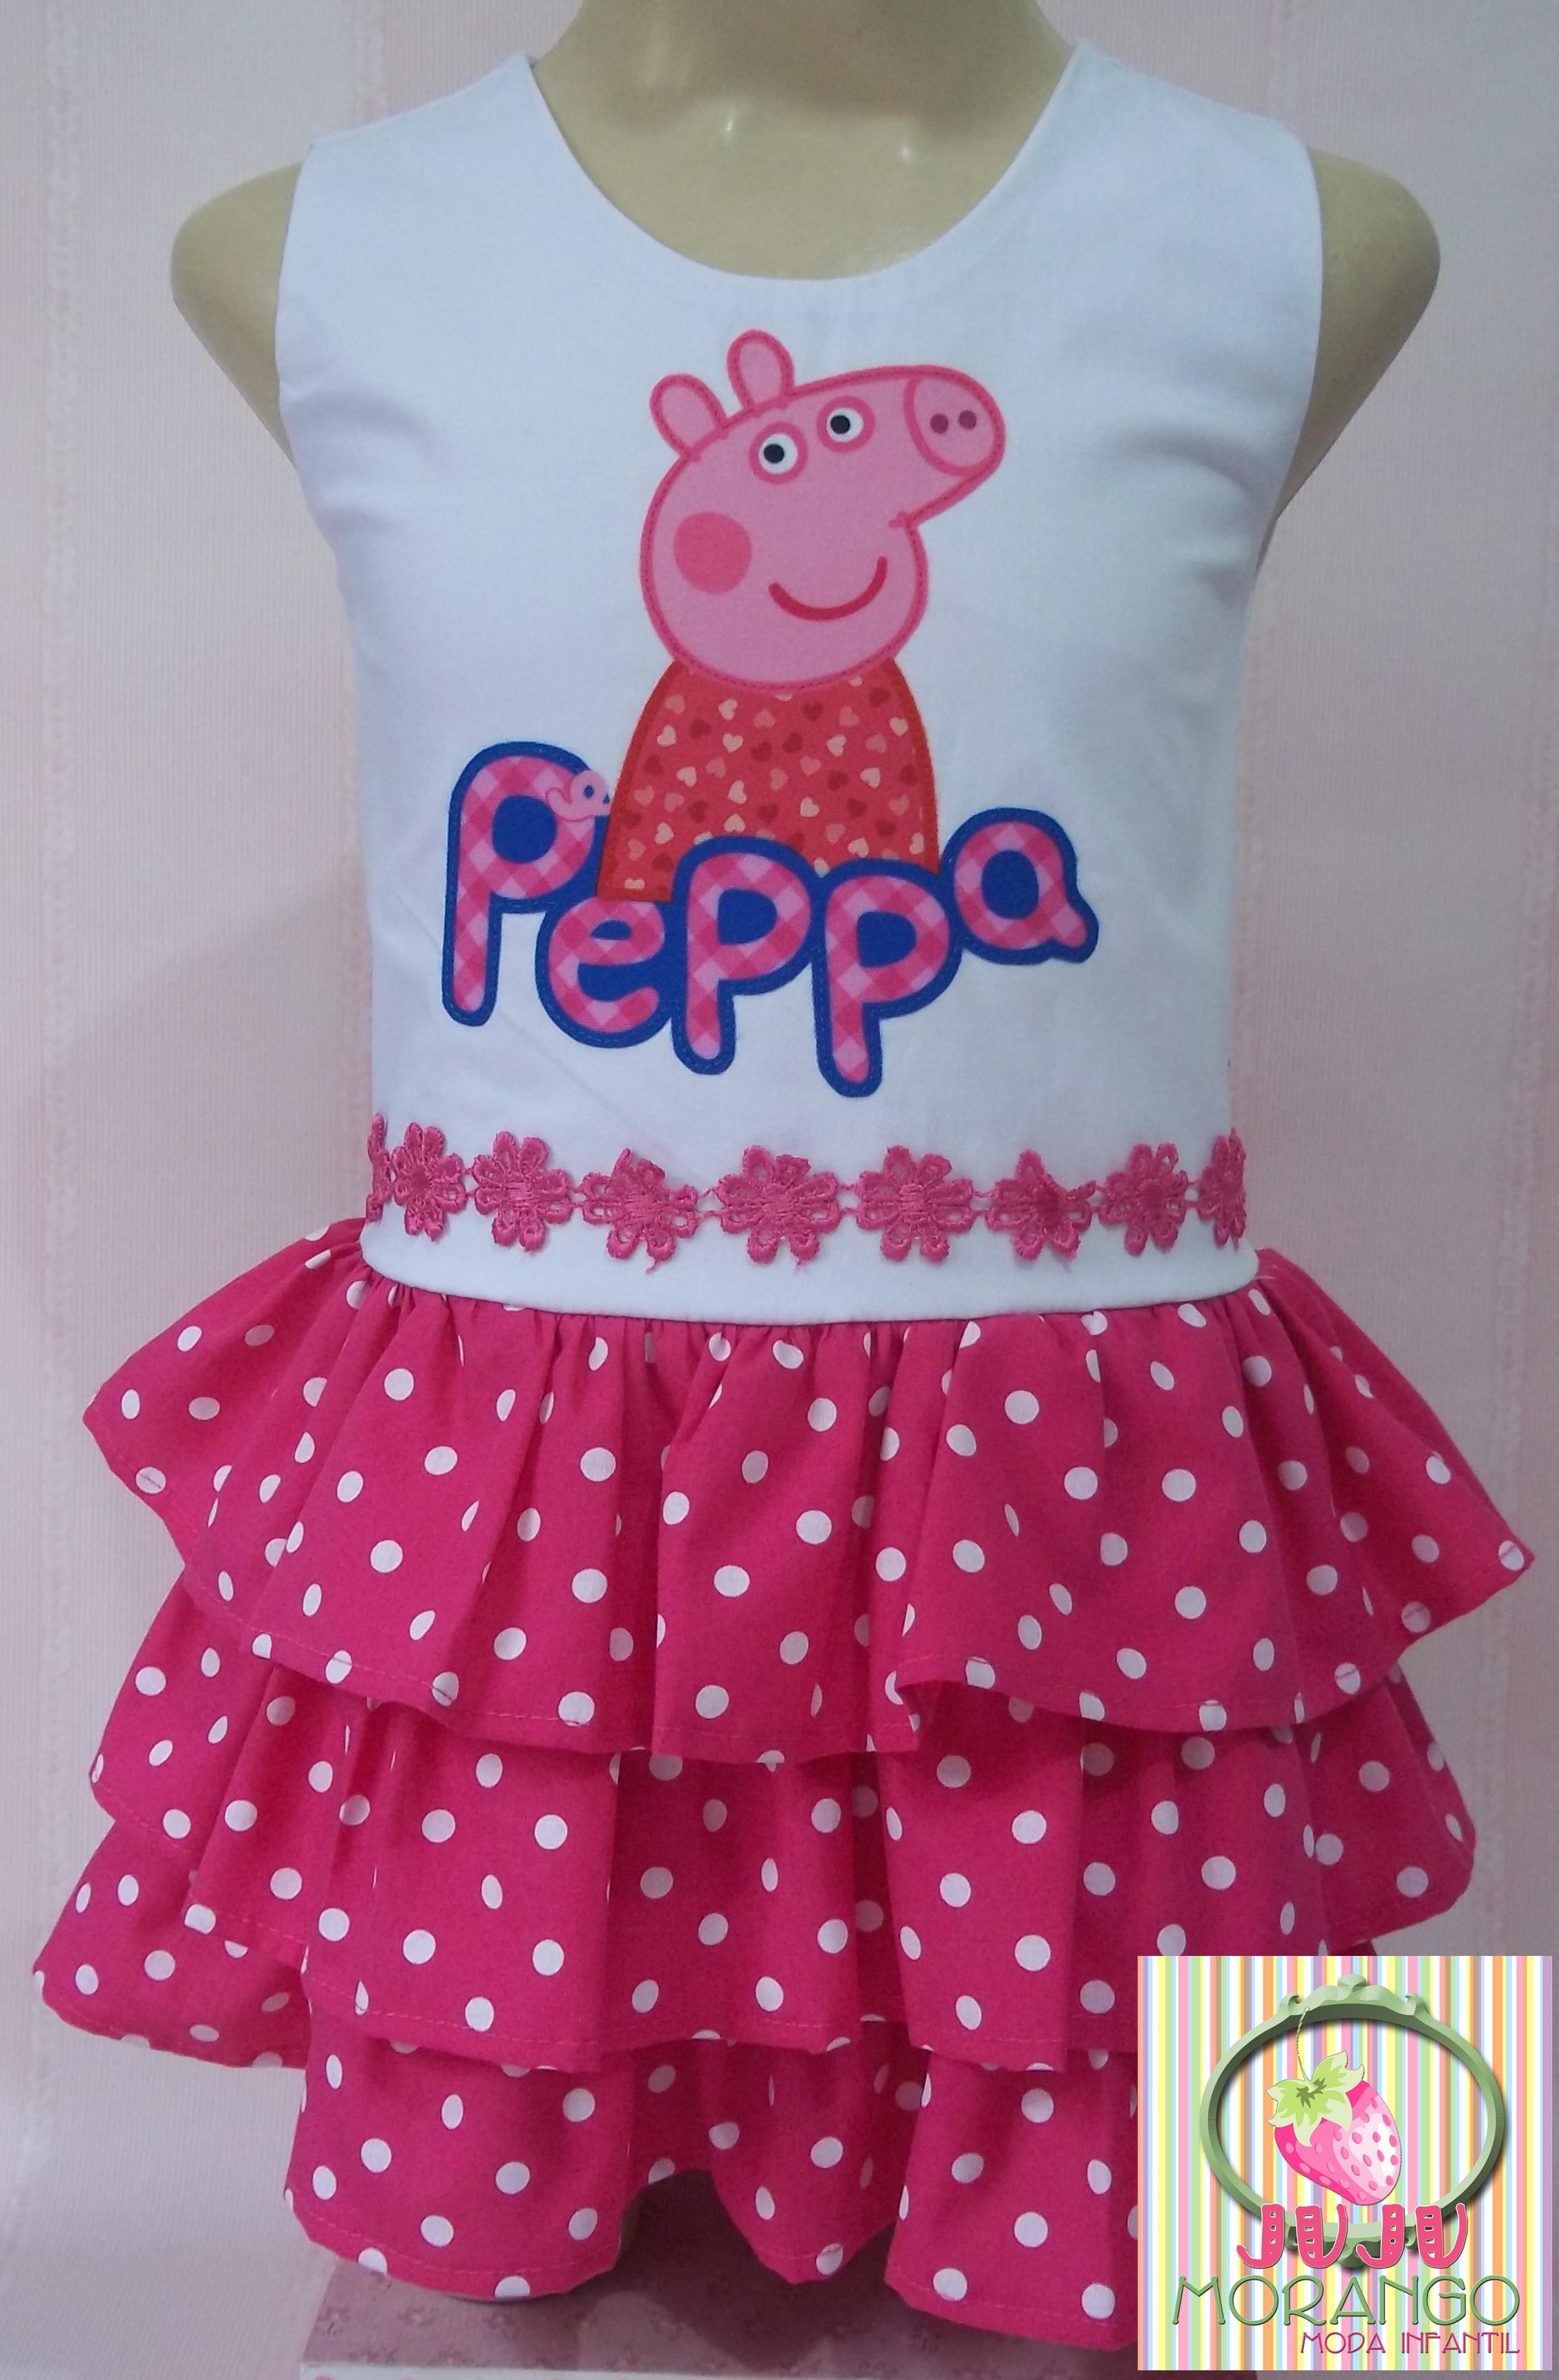 dd3716daa Vestido Peppa Pig no Elo7   Juju Morango Moda Infantil (546F5C)